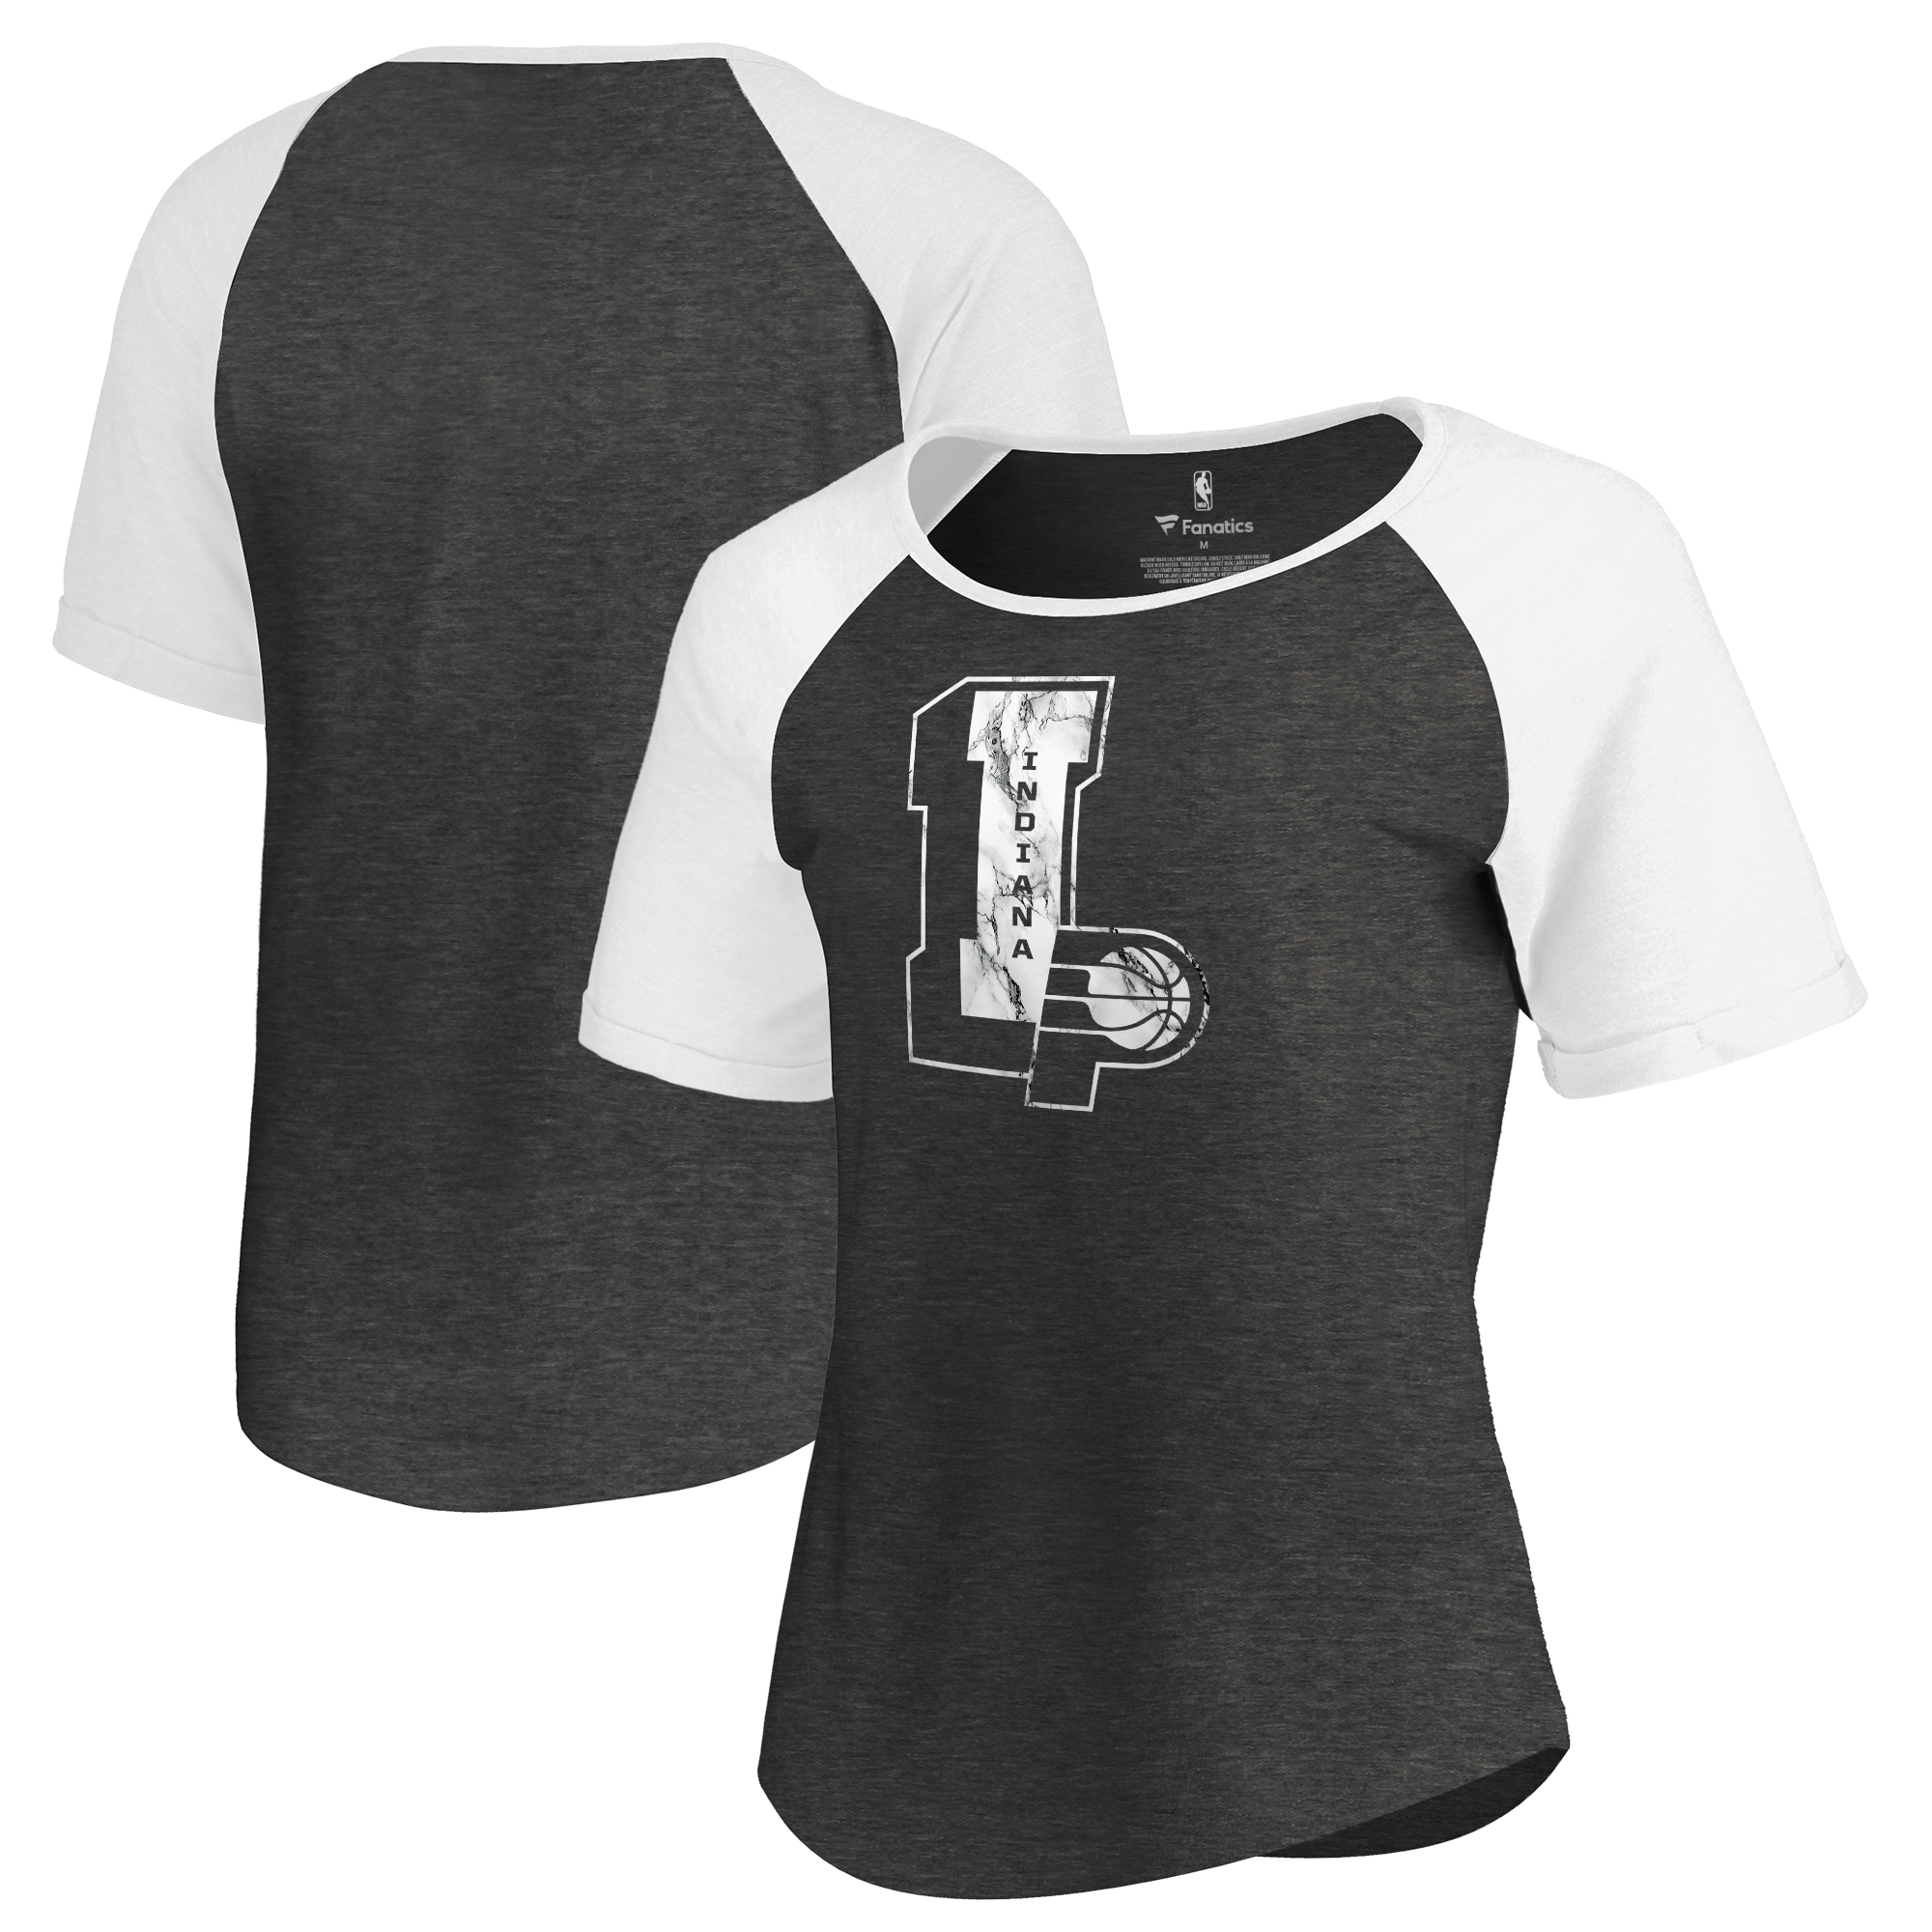 Indiana Pacers Fanatics Branded Women's Letterman Tri-Blend Raglan T-Shirt - Black